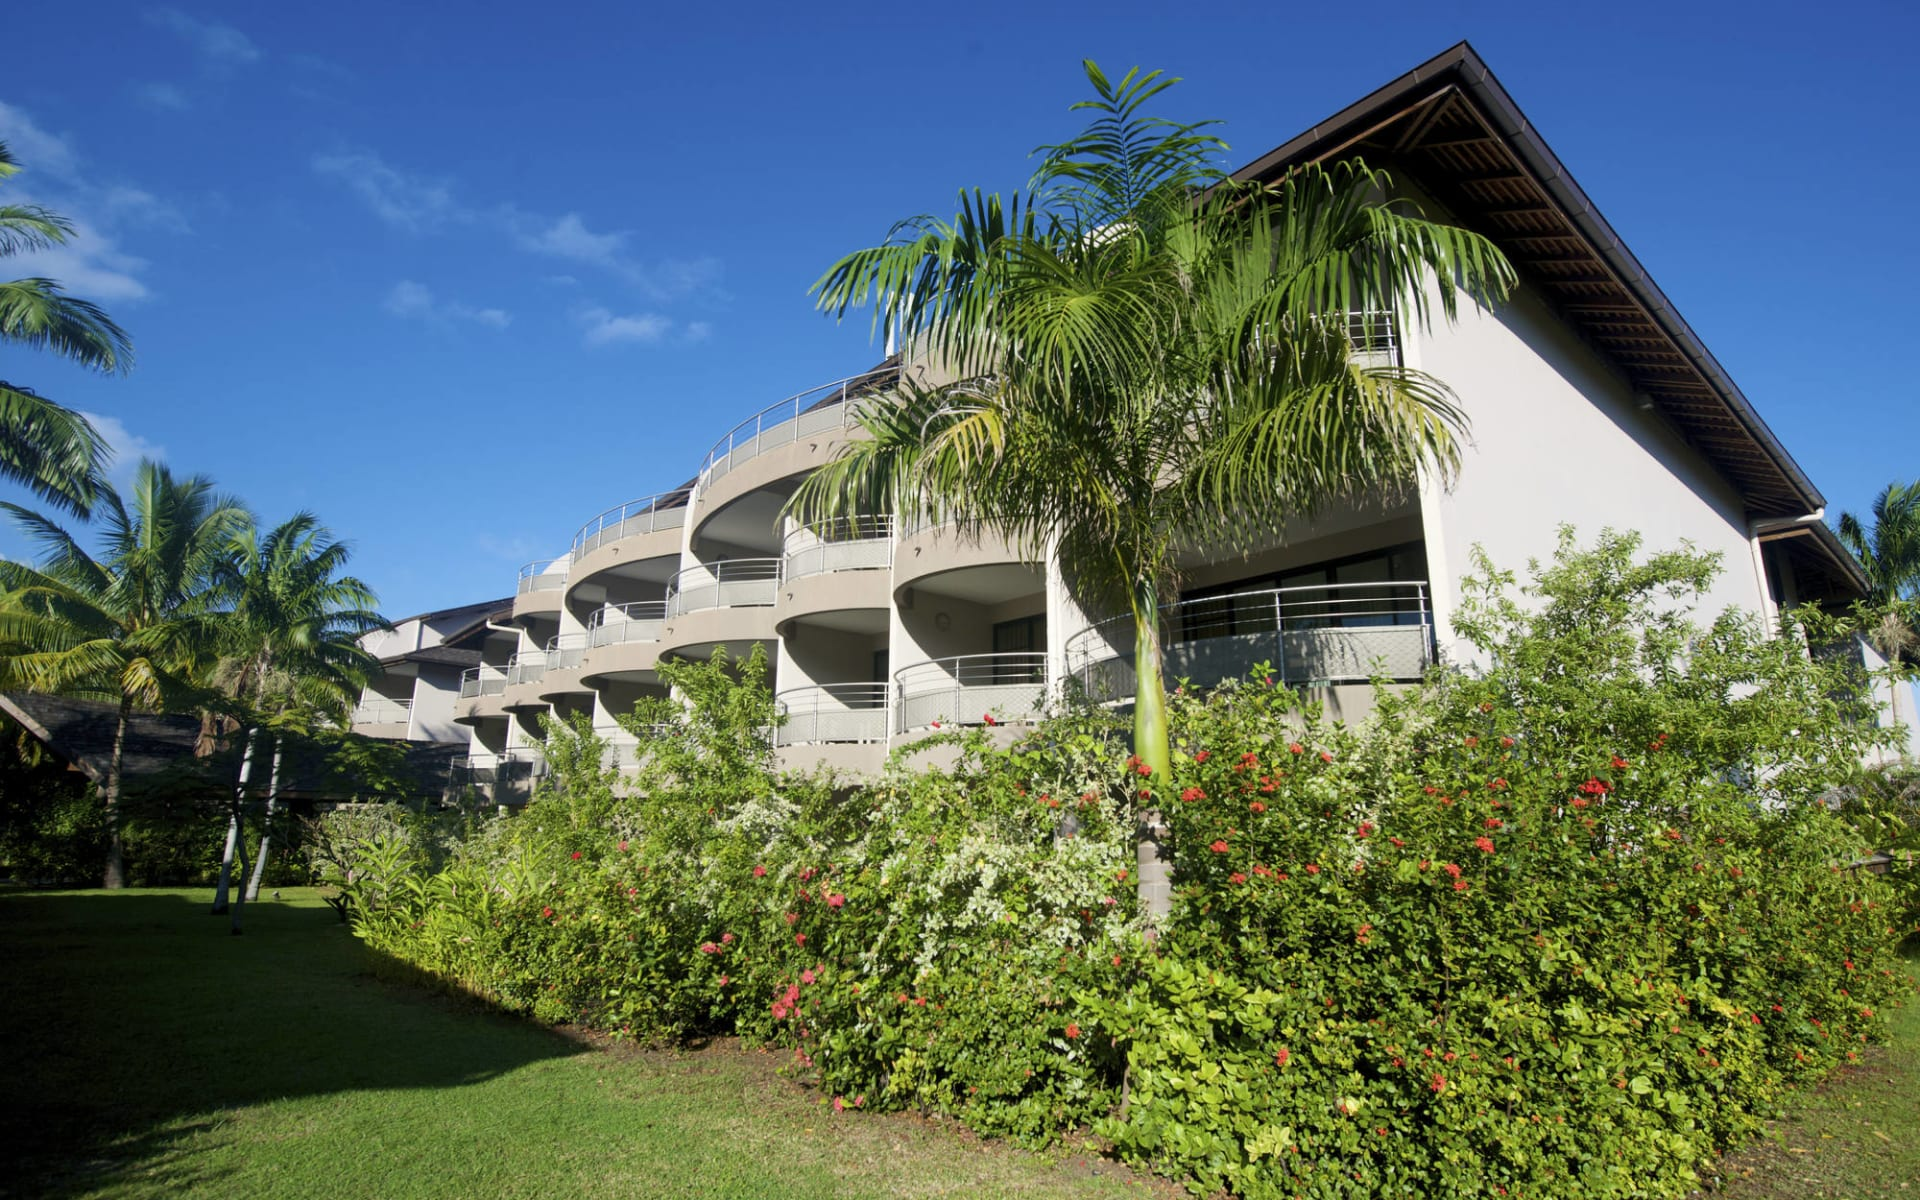 Manava Suite Resort Tahiti in Papeete:  PPT Pearl Manava (7)